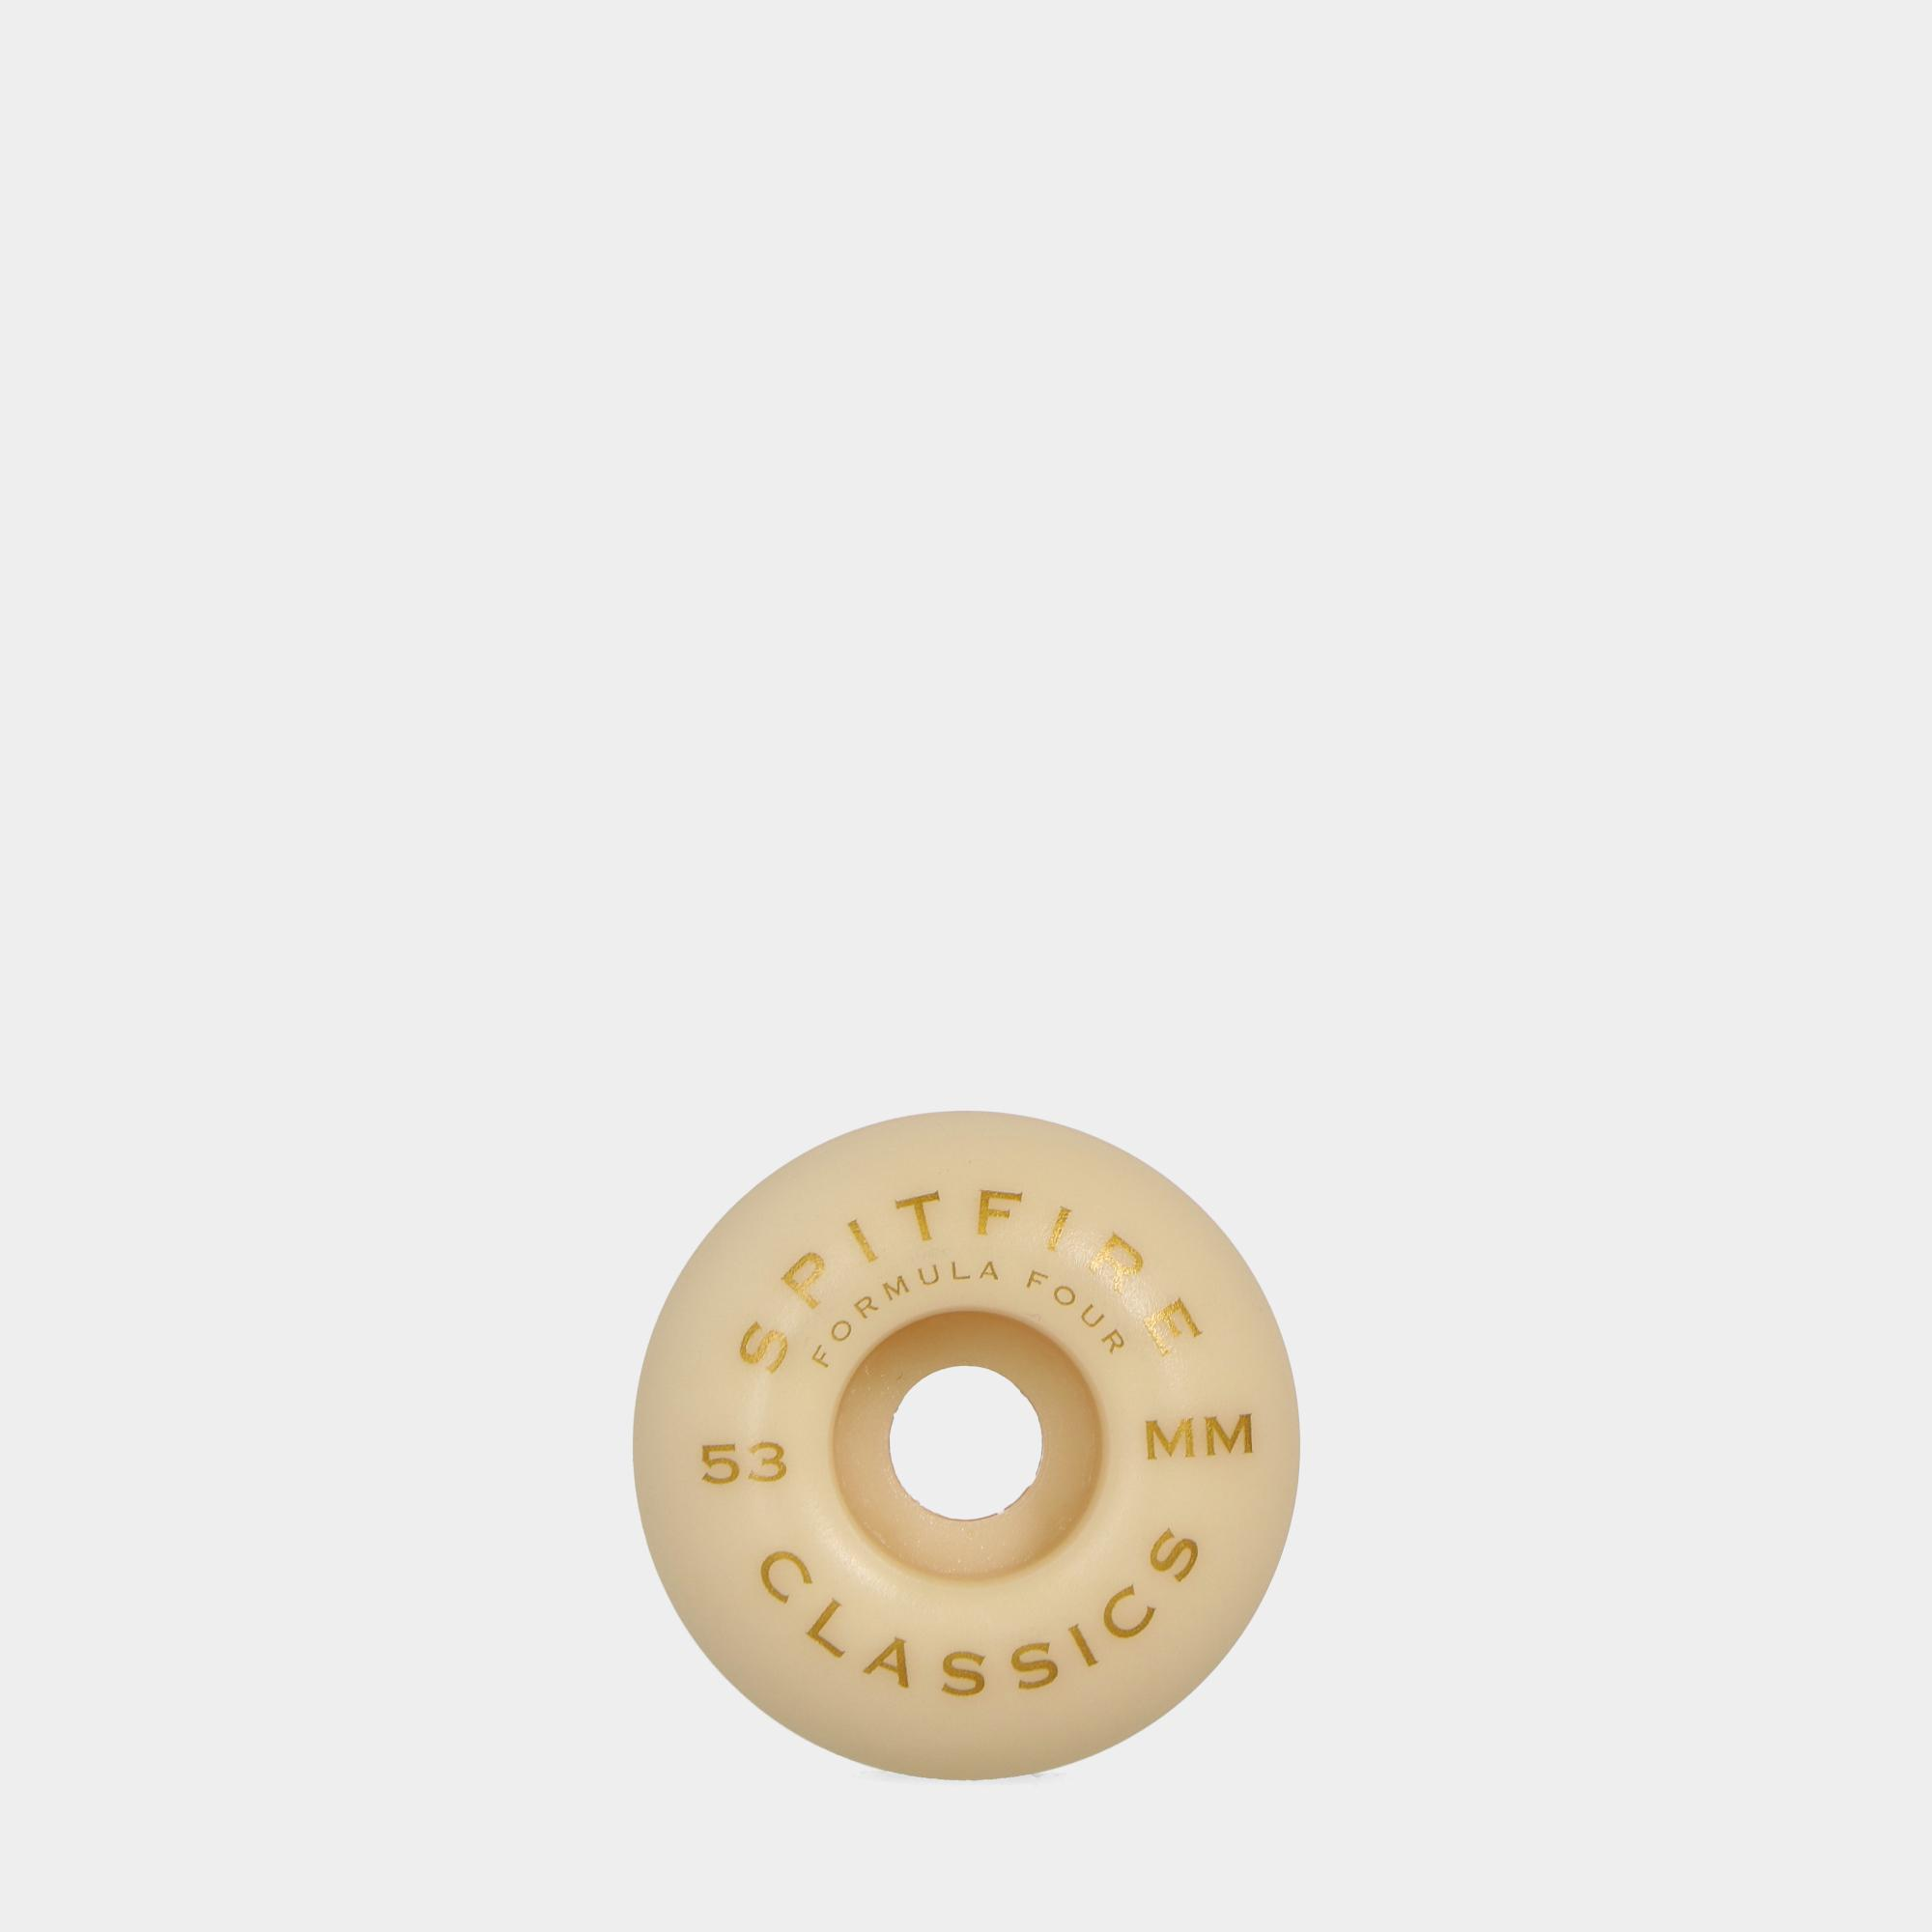 Spitfire F4 Classic Wheels 53mm ASSORTED